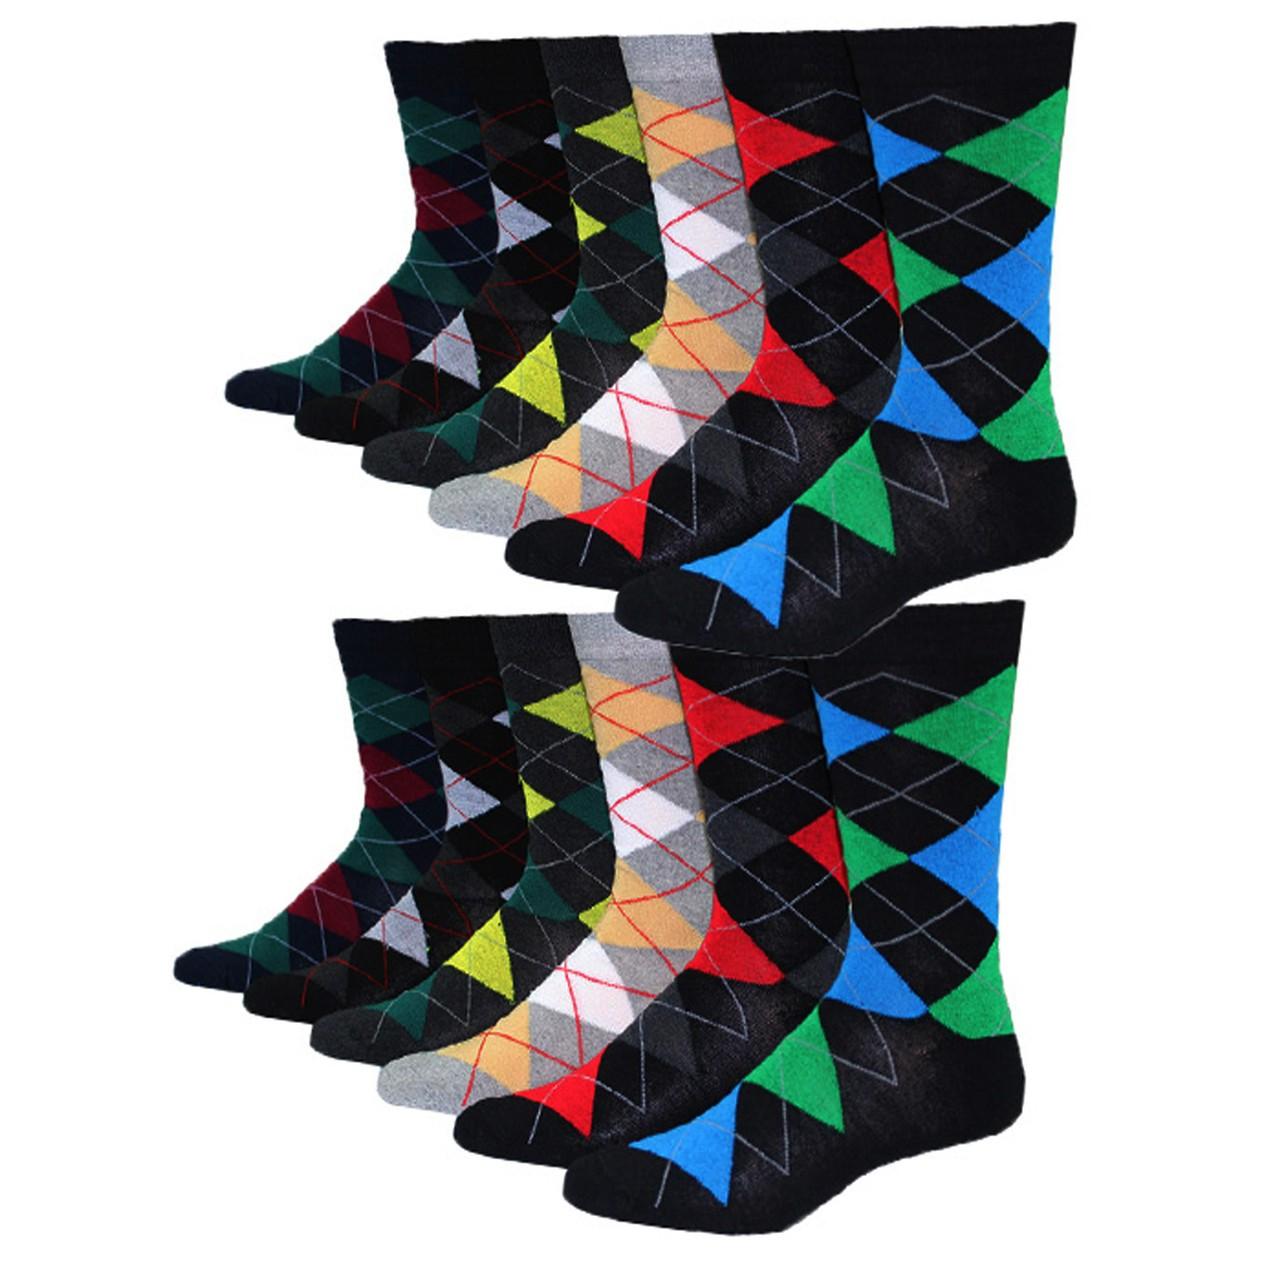 12-Pairs Men's Premium Cotton-Blend Colorful Patterned Dress Socks